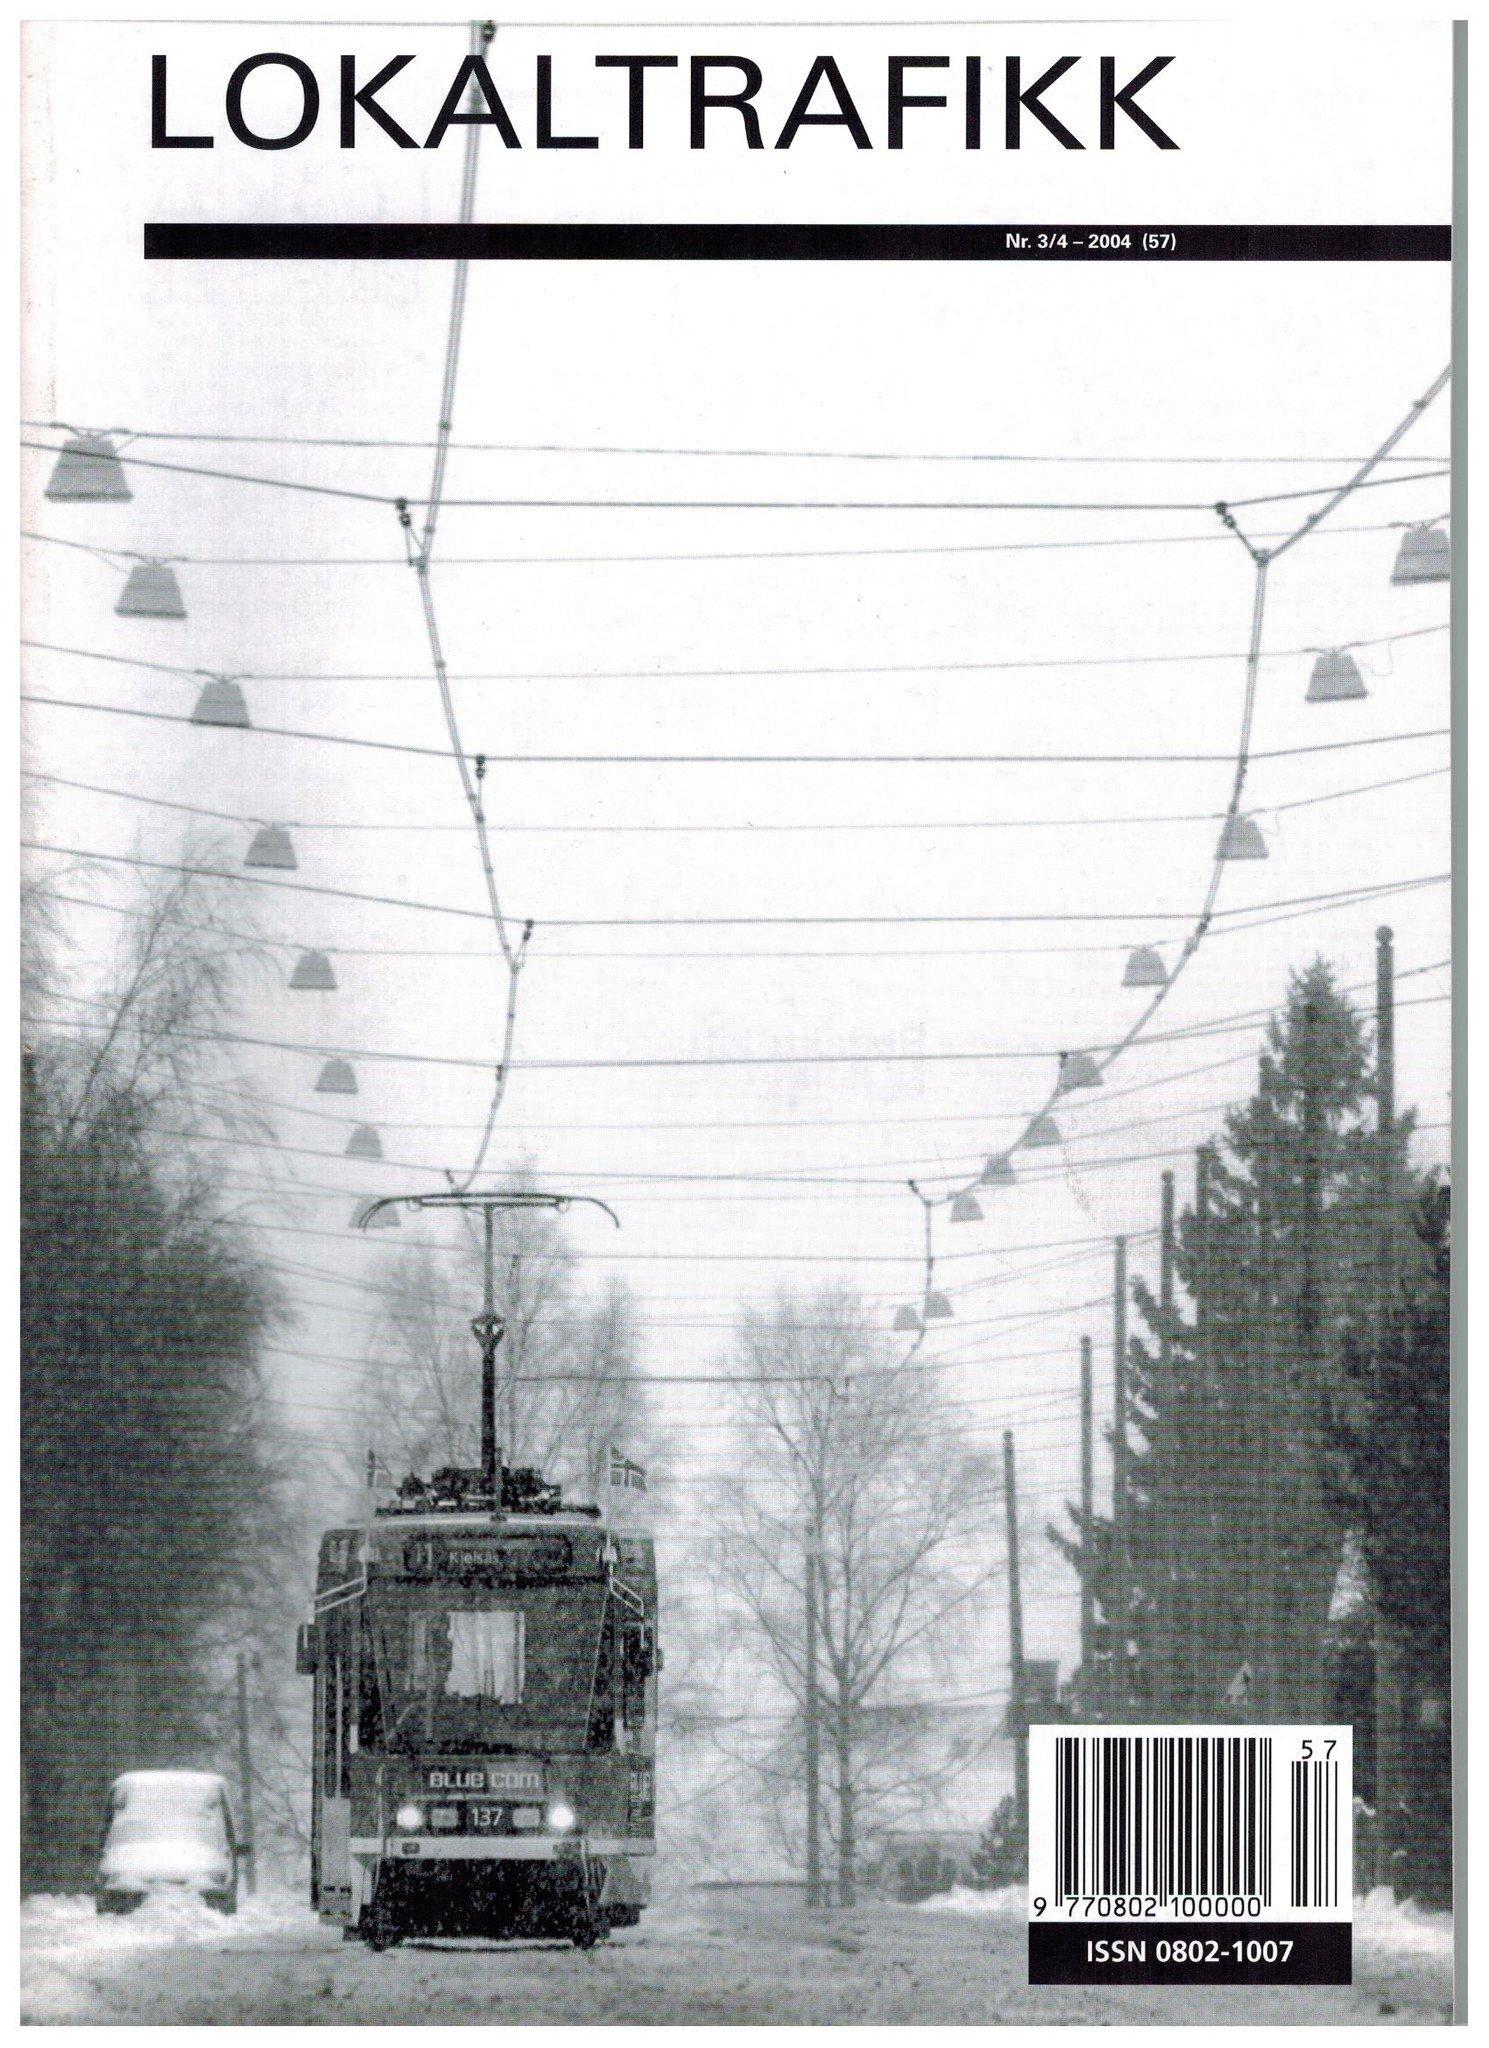 Lokaltrafikk #057